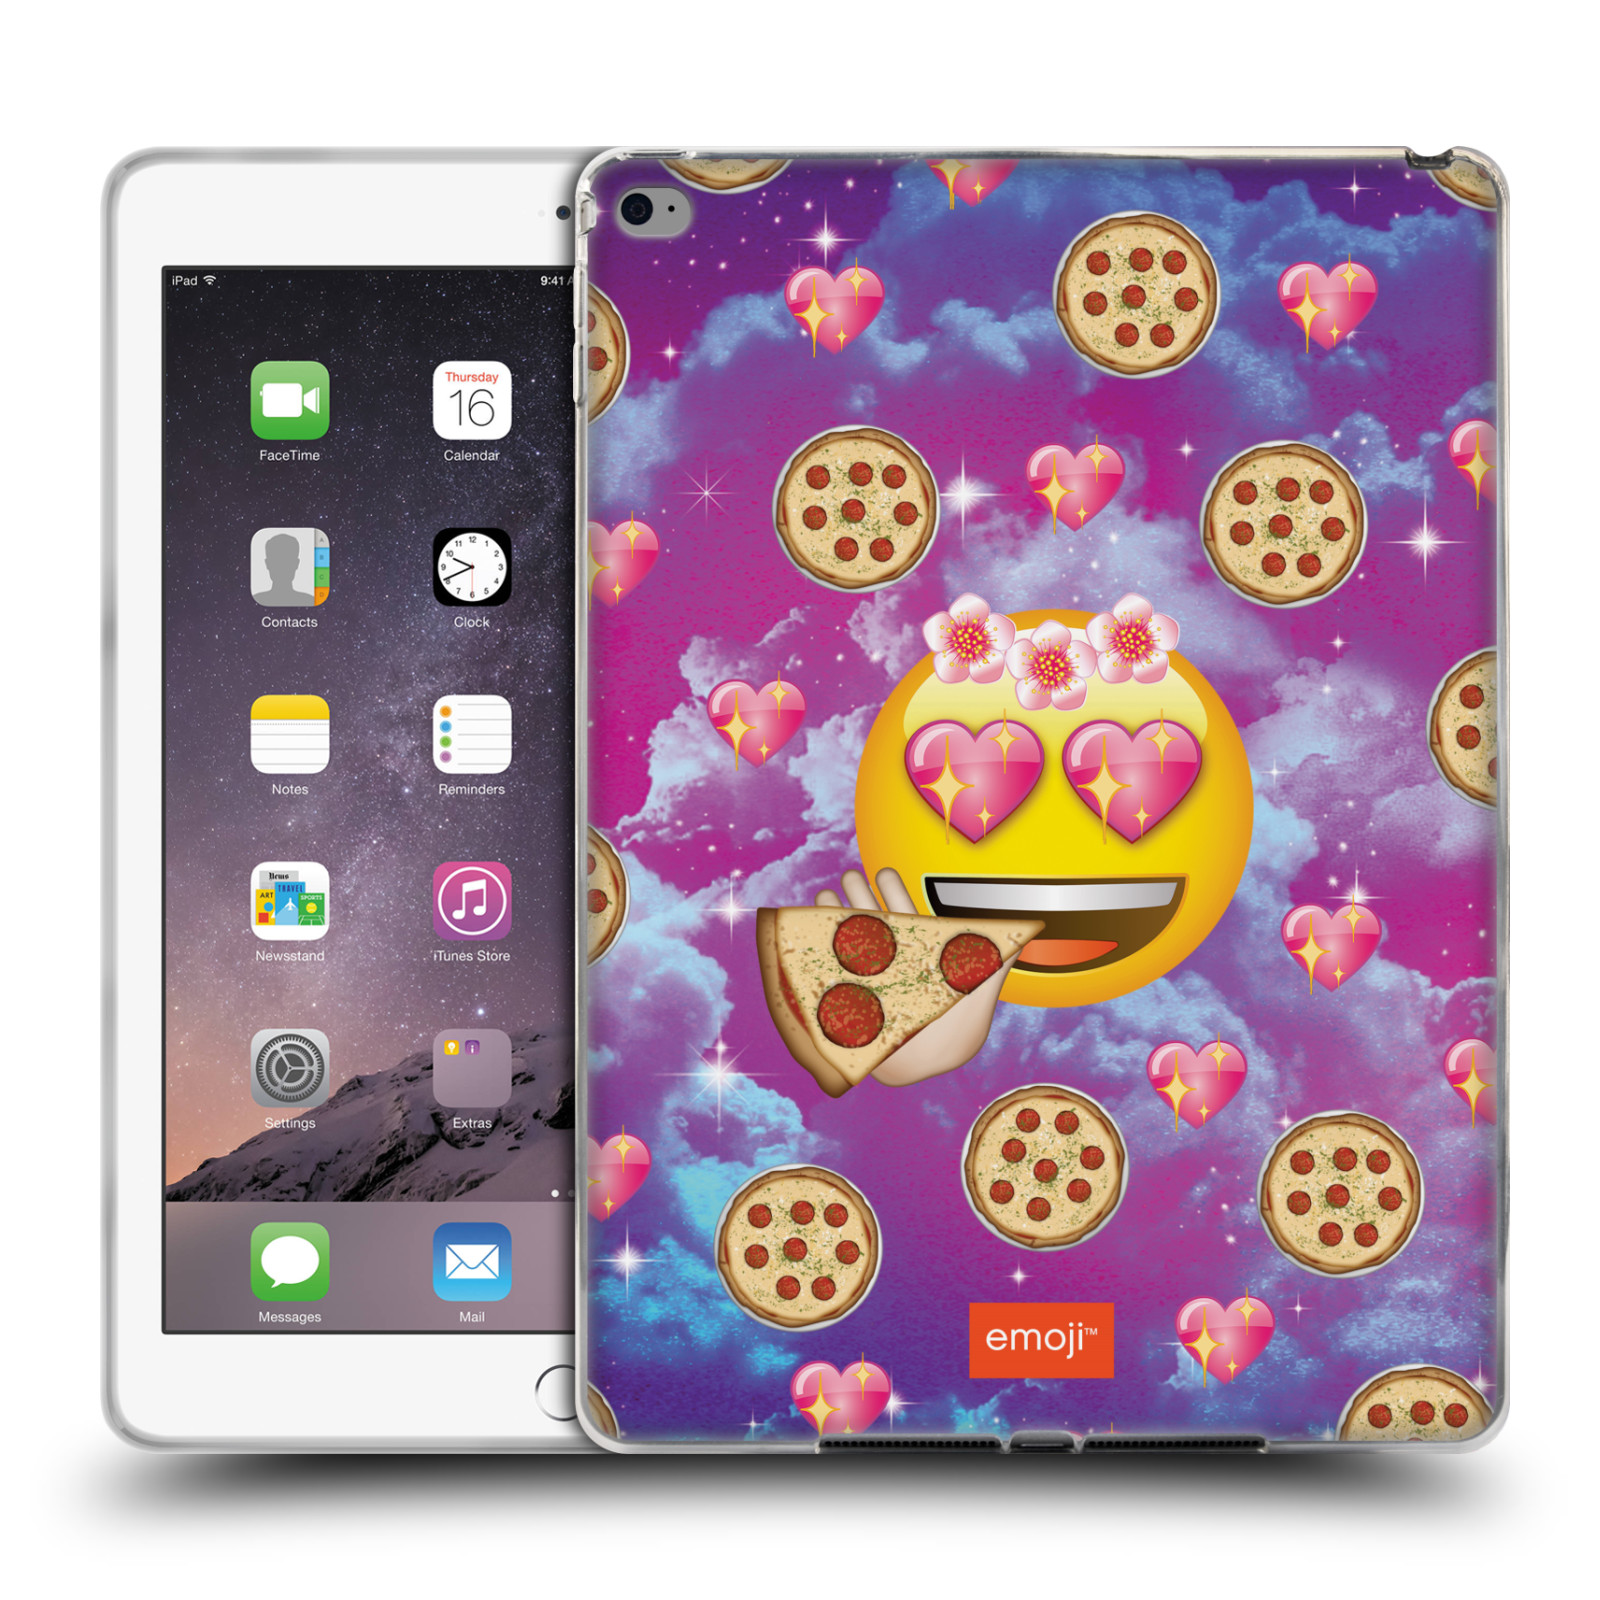 officiel emoji smileys tui coque en gel molle pour apple. Black Bedroom Furniture Sets. Home Design Ideas